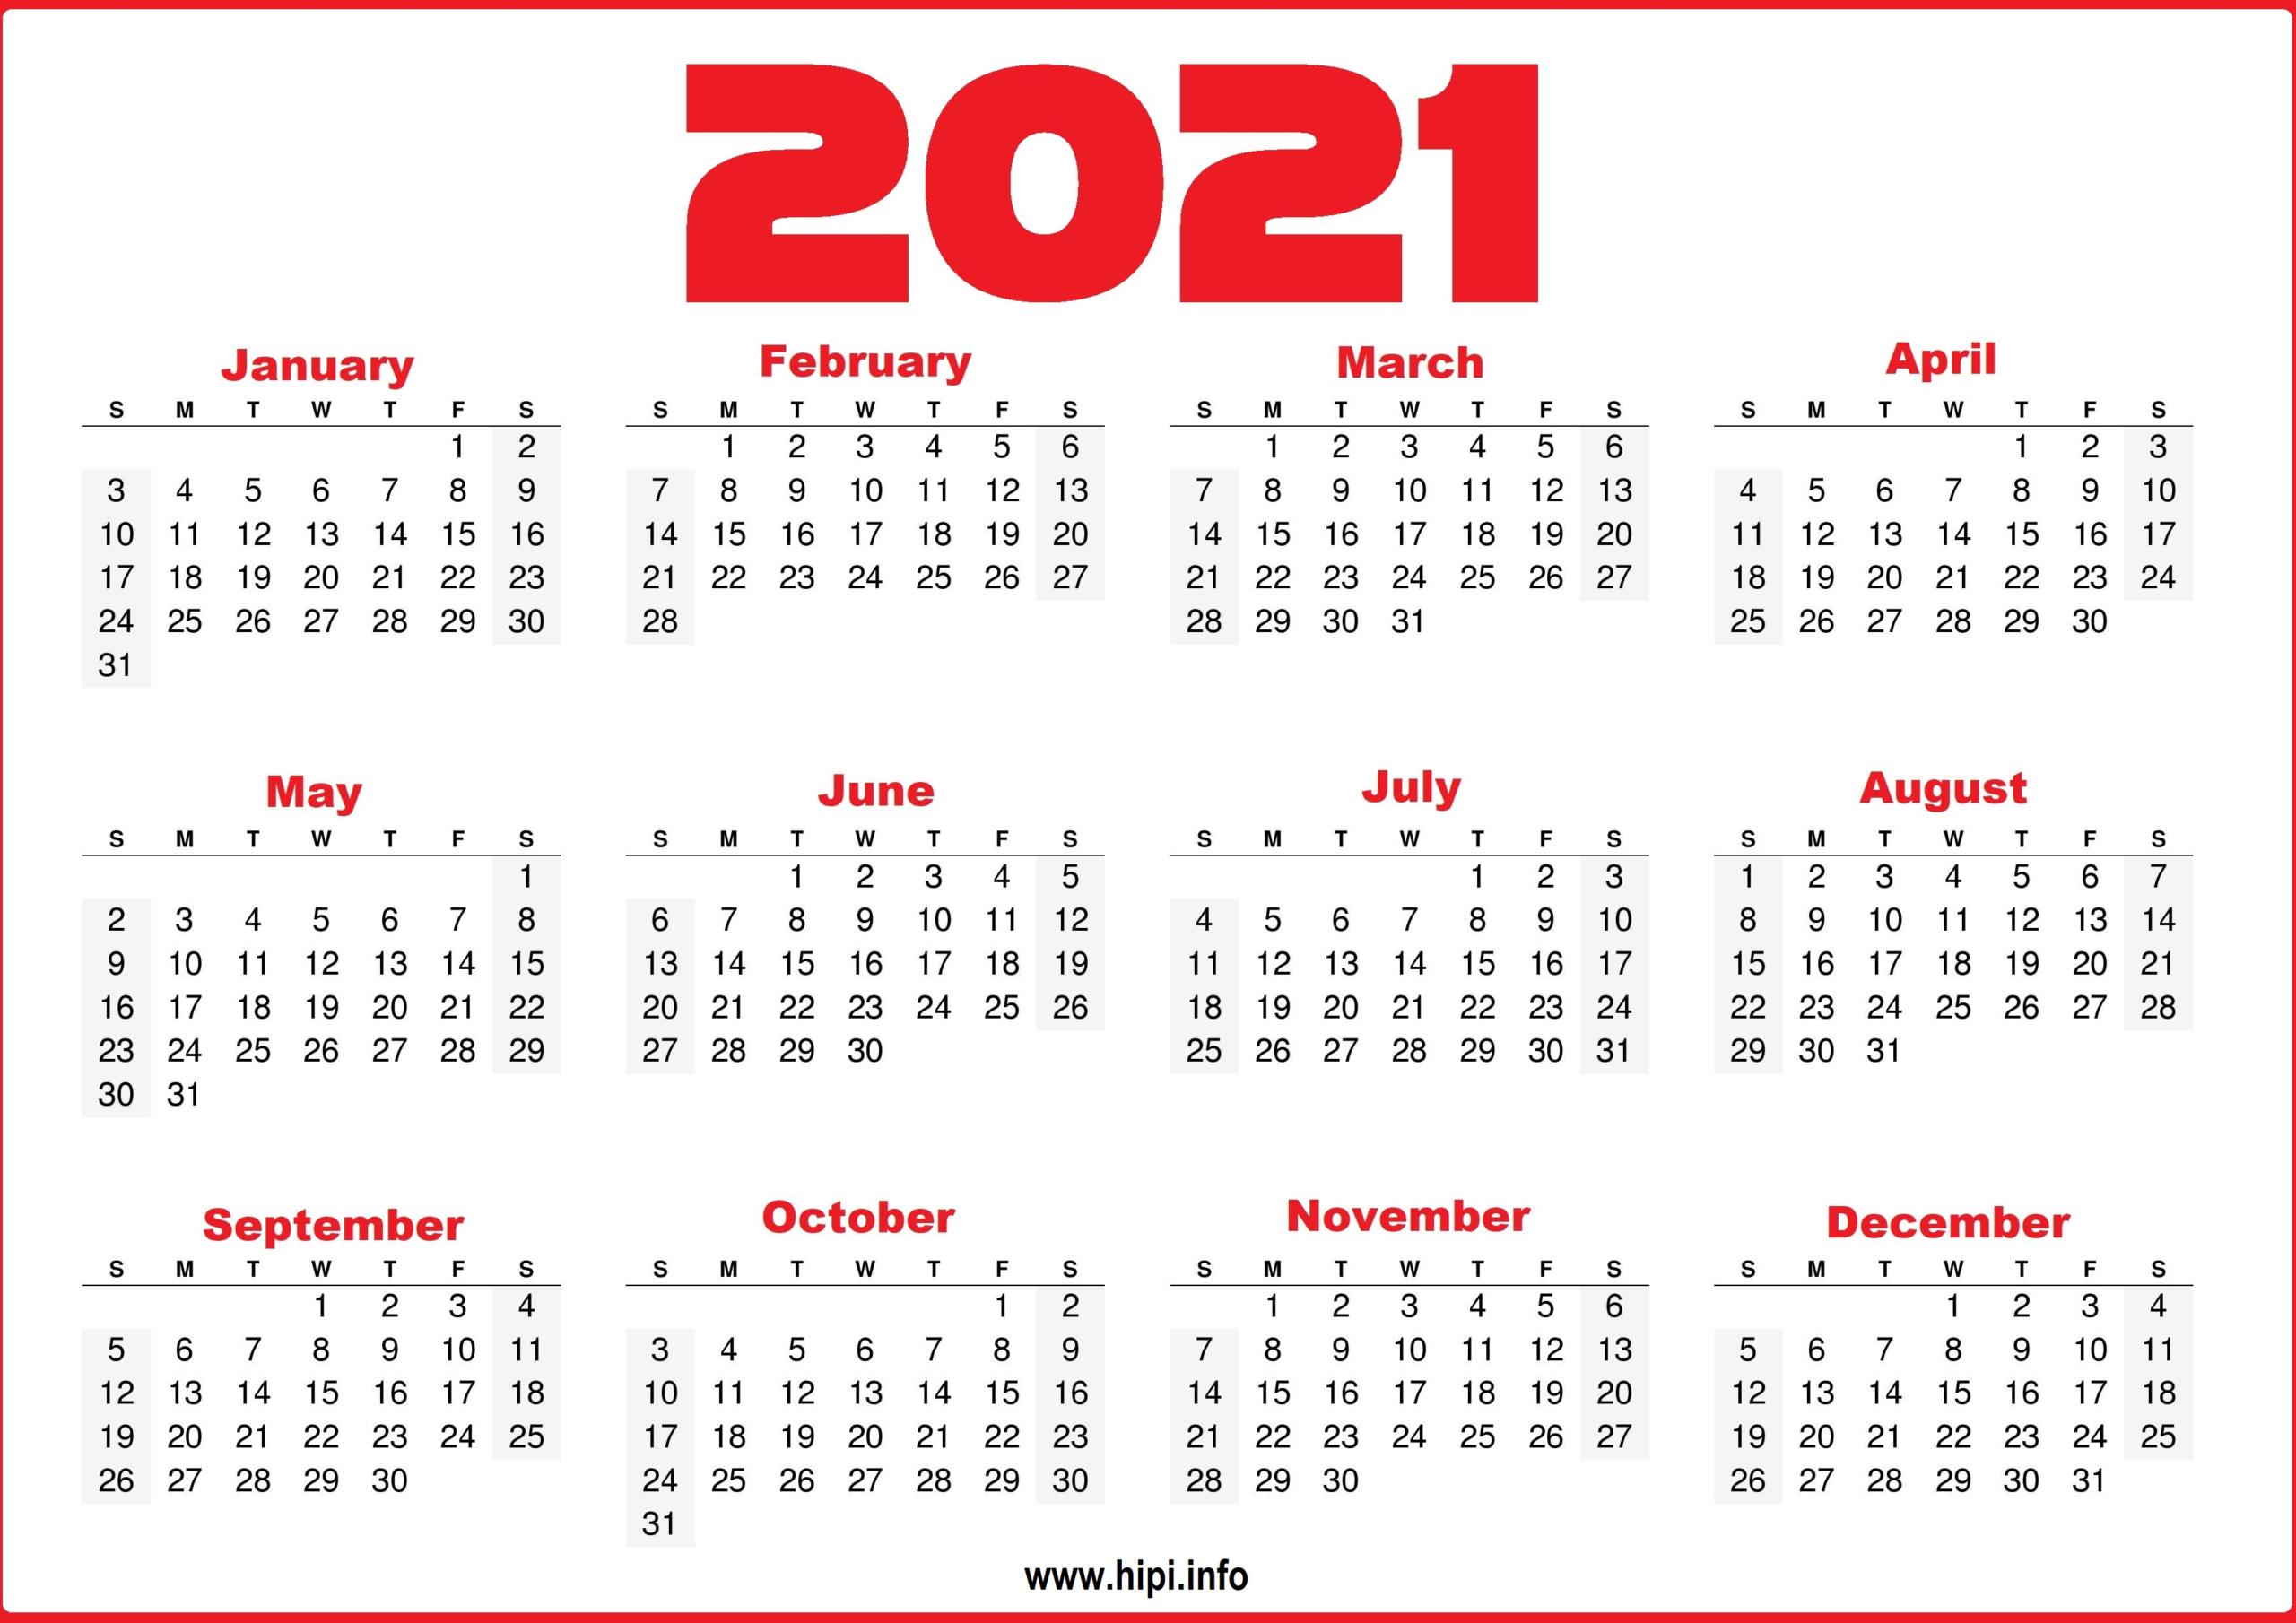 Free Printable 12 Month 2021 Calendar With Lines   Printable Calendars 2021